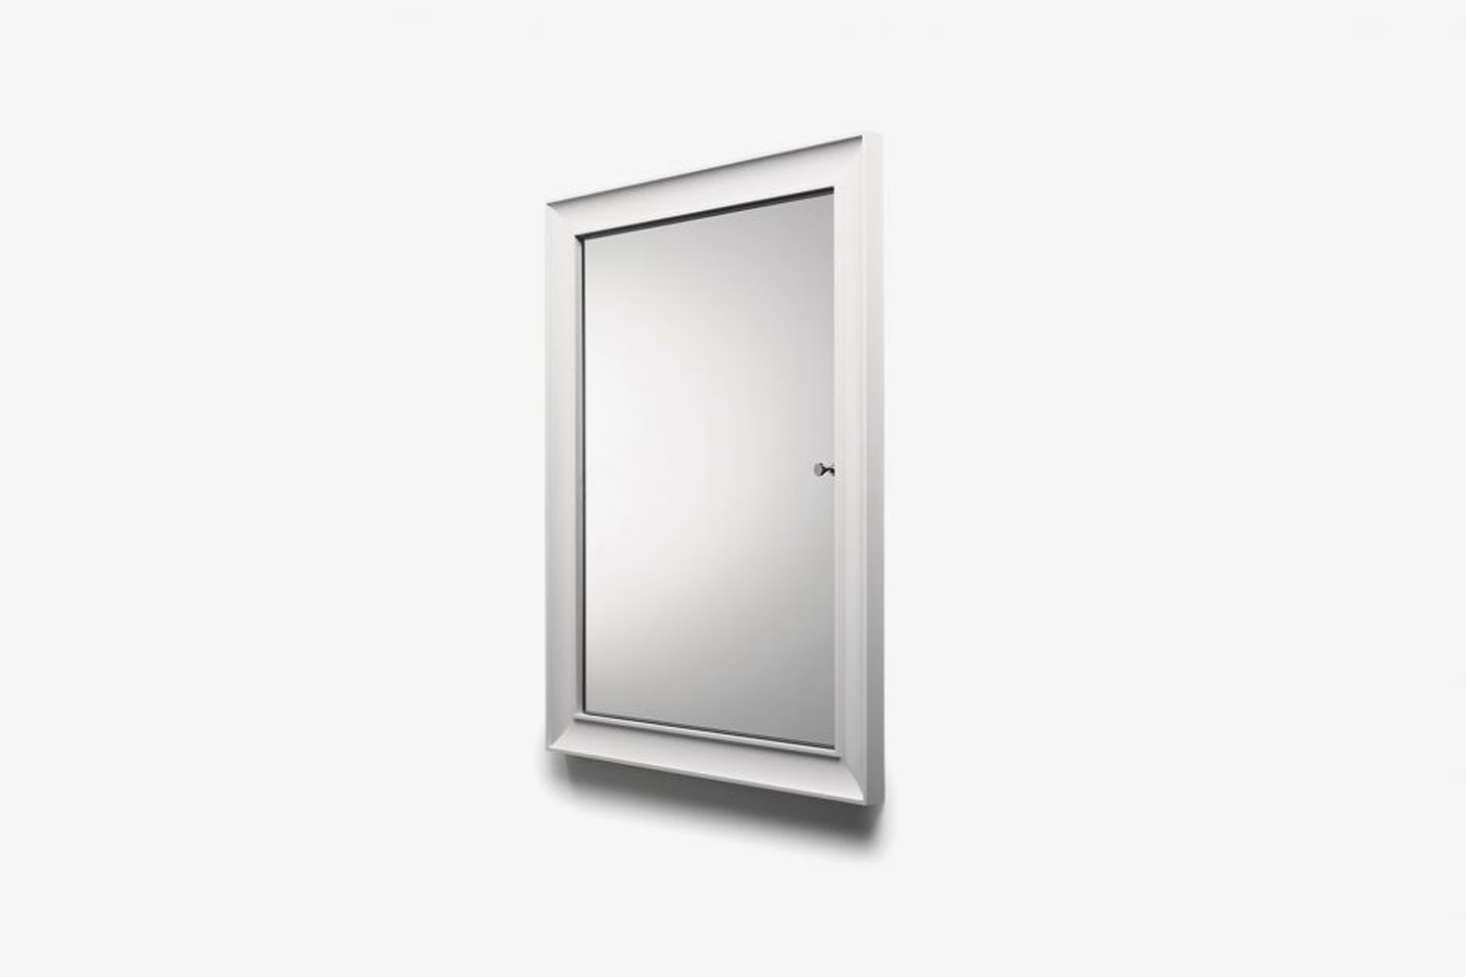 10 Easy Pieces Inset Mirrored Medicine Cabinets Remodelista